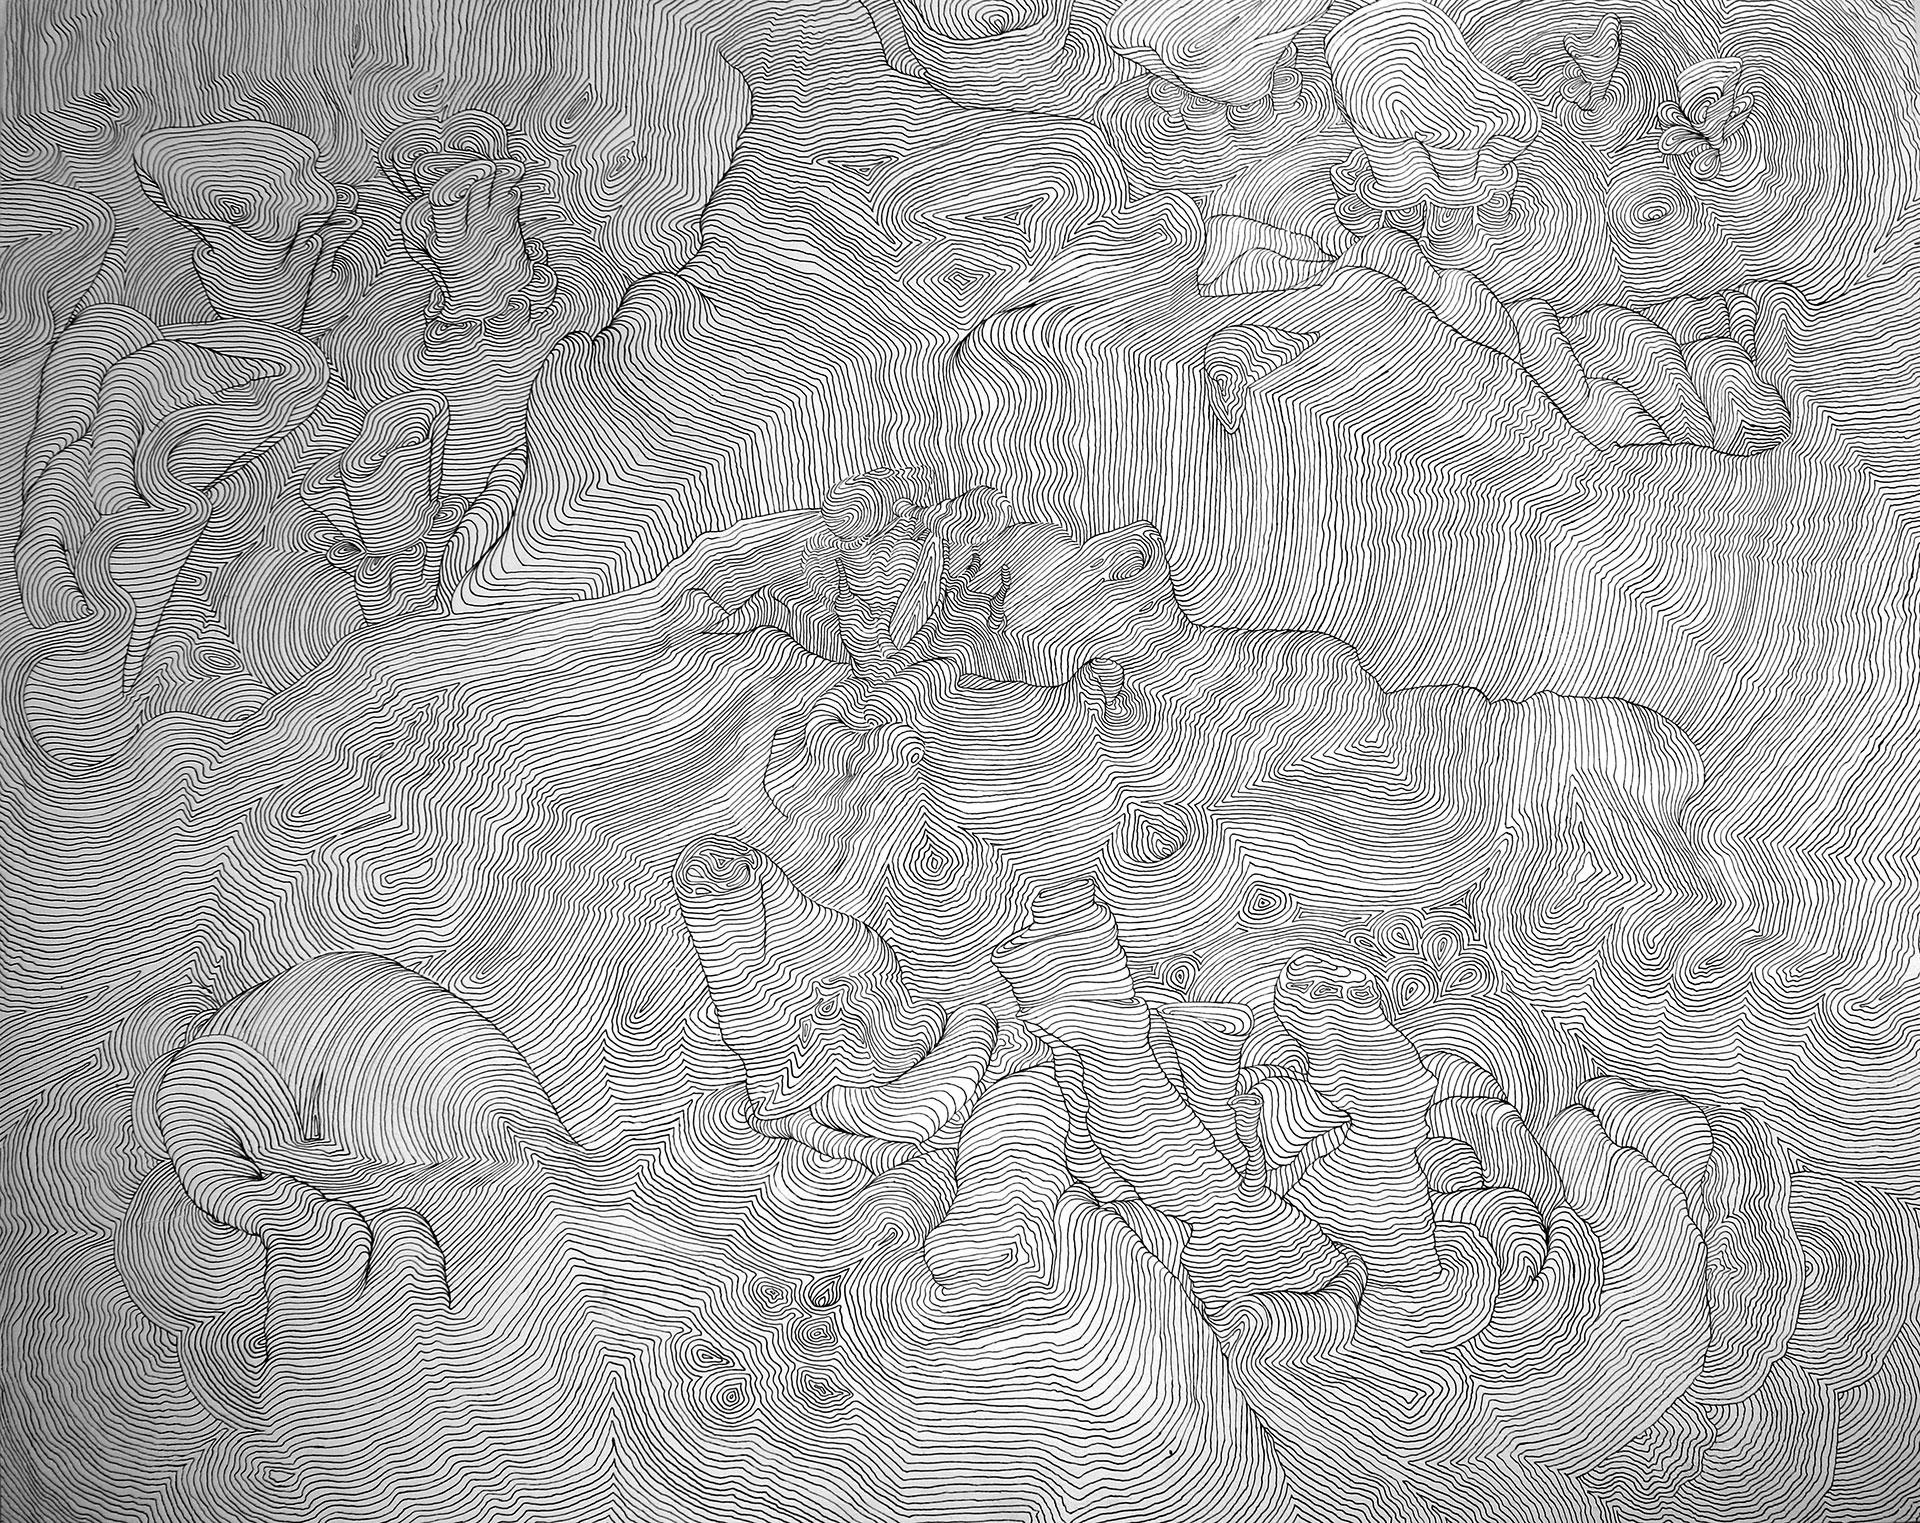 Landscape. Acrylic on canvas. 120 x 90 cm